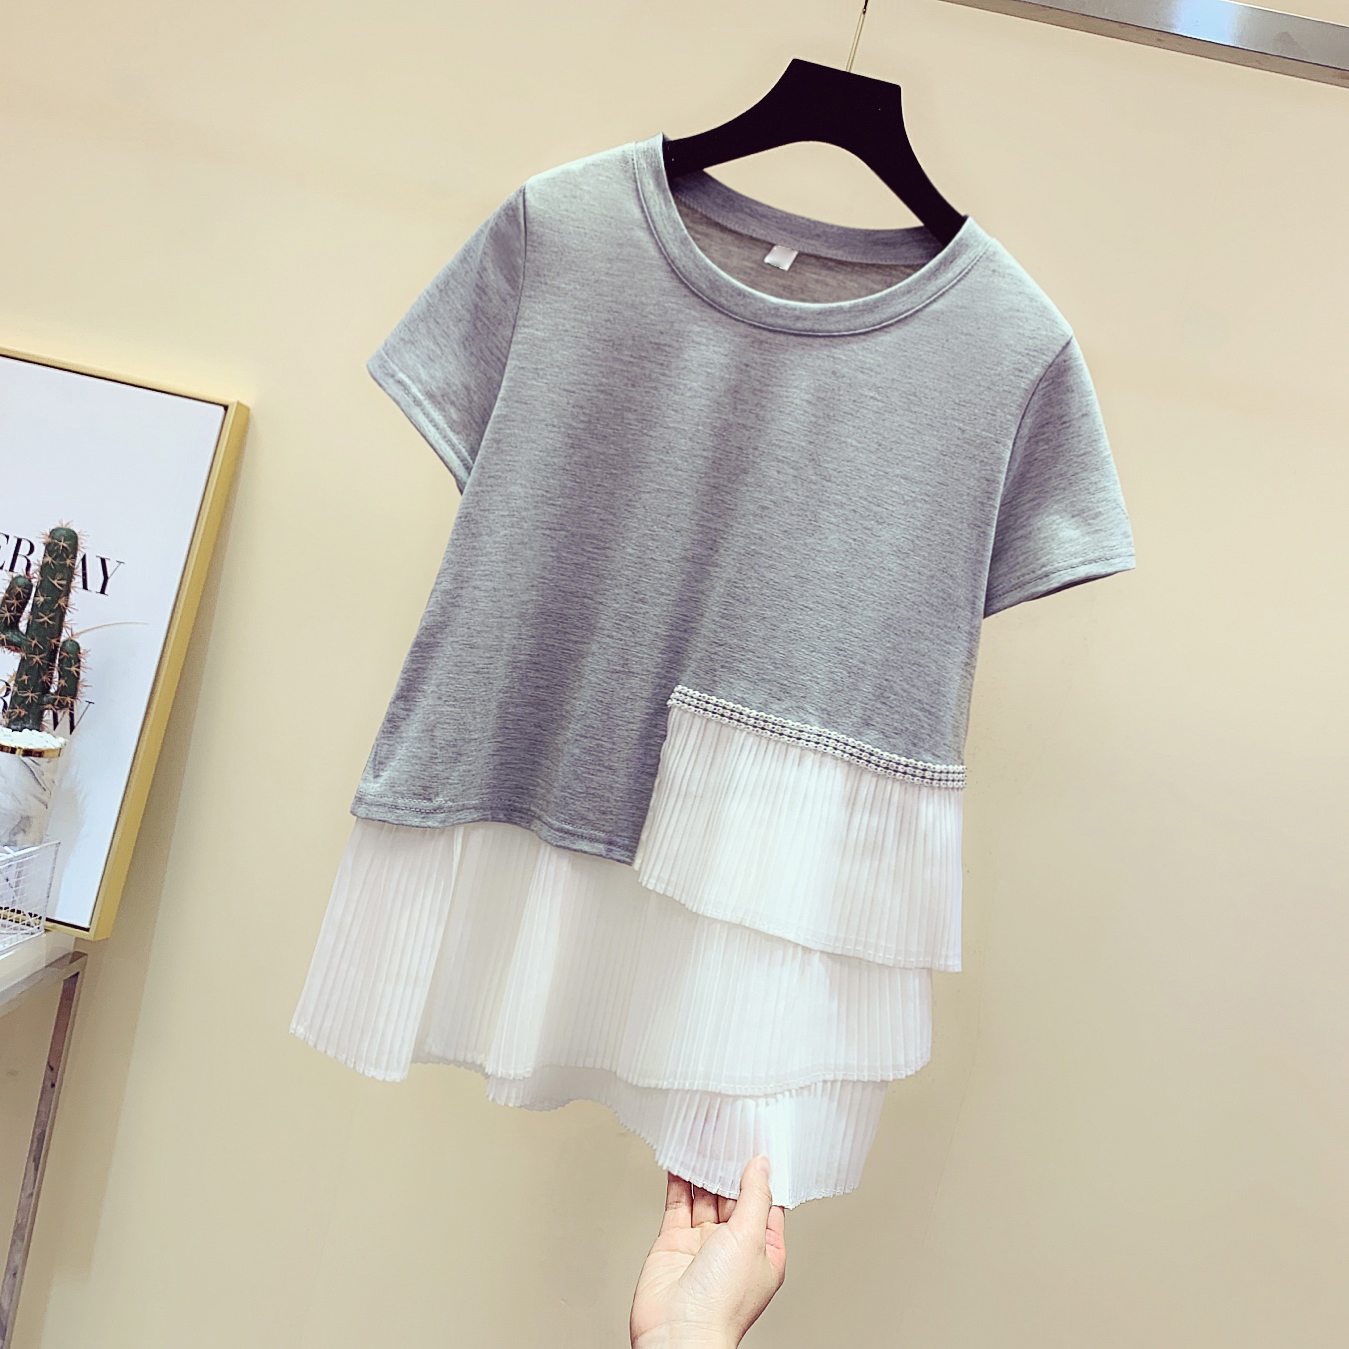 Chiffon Irregular Stitching Diamond Short Sleeve Cotton T-shirt Women's 2020 Spring Summer New Korean Style Tshirt Loose Grey T